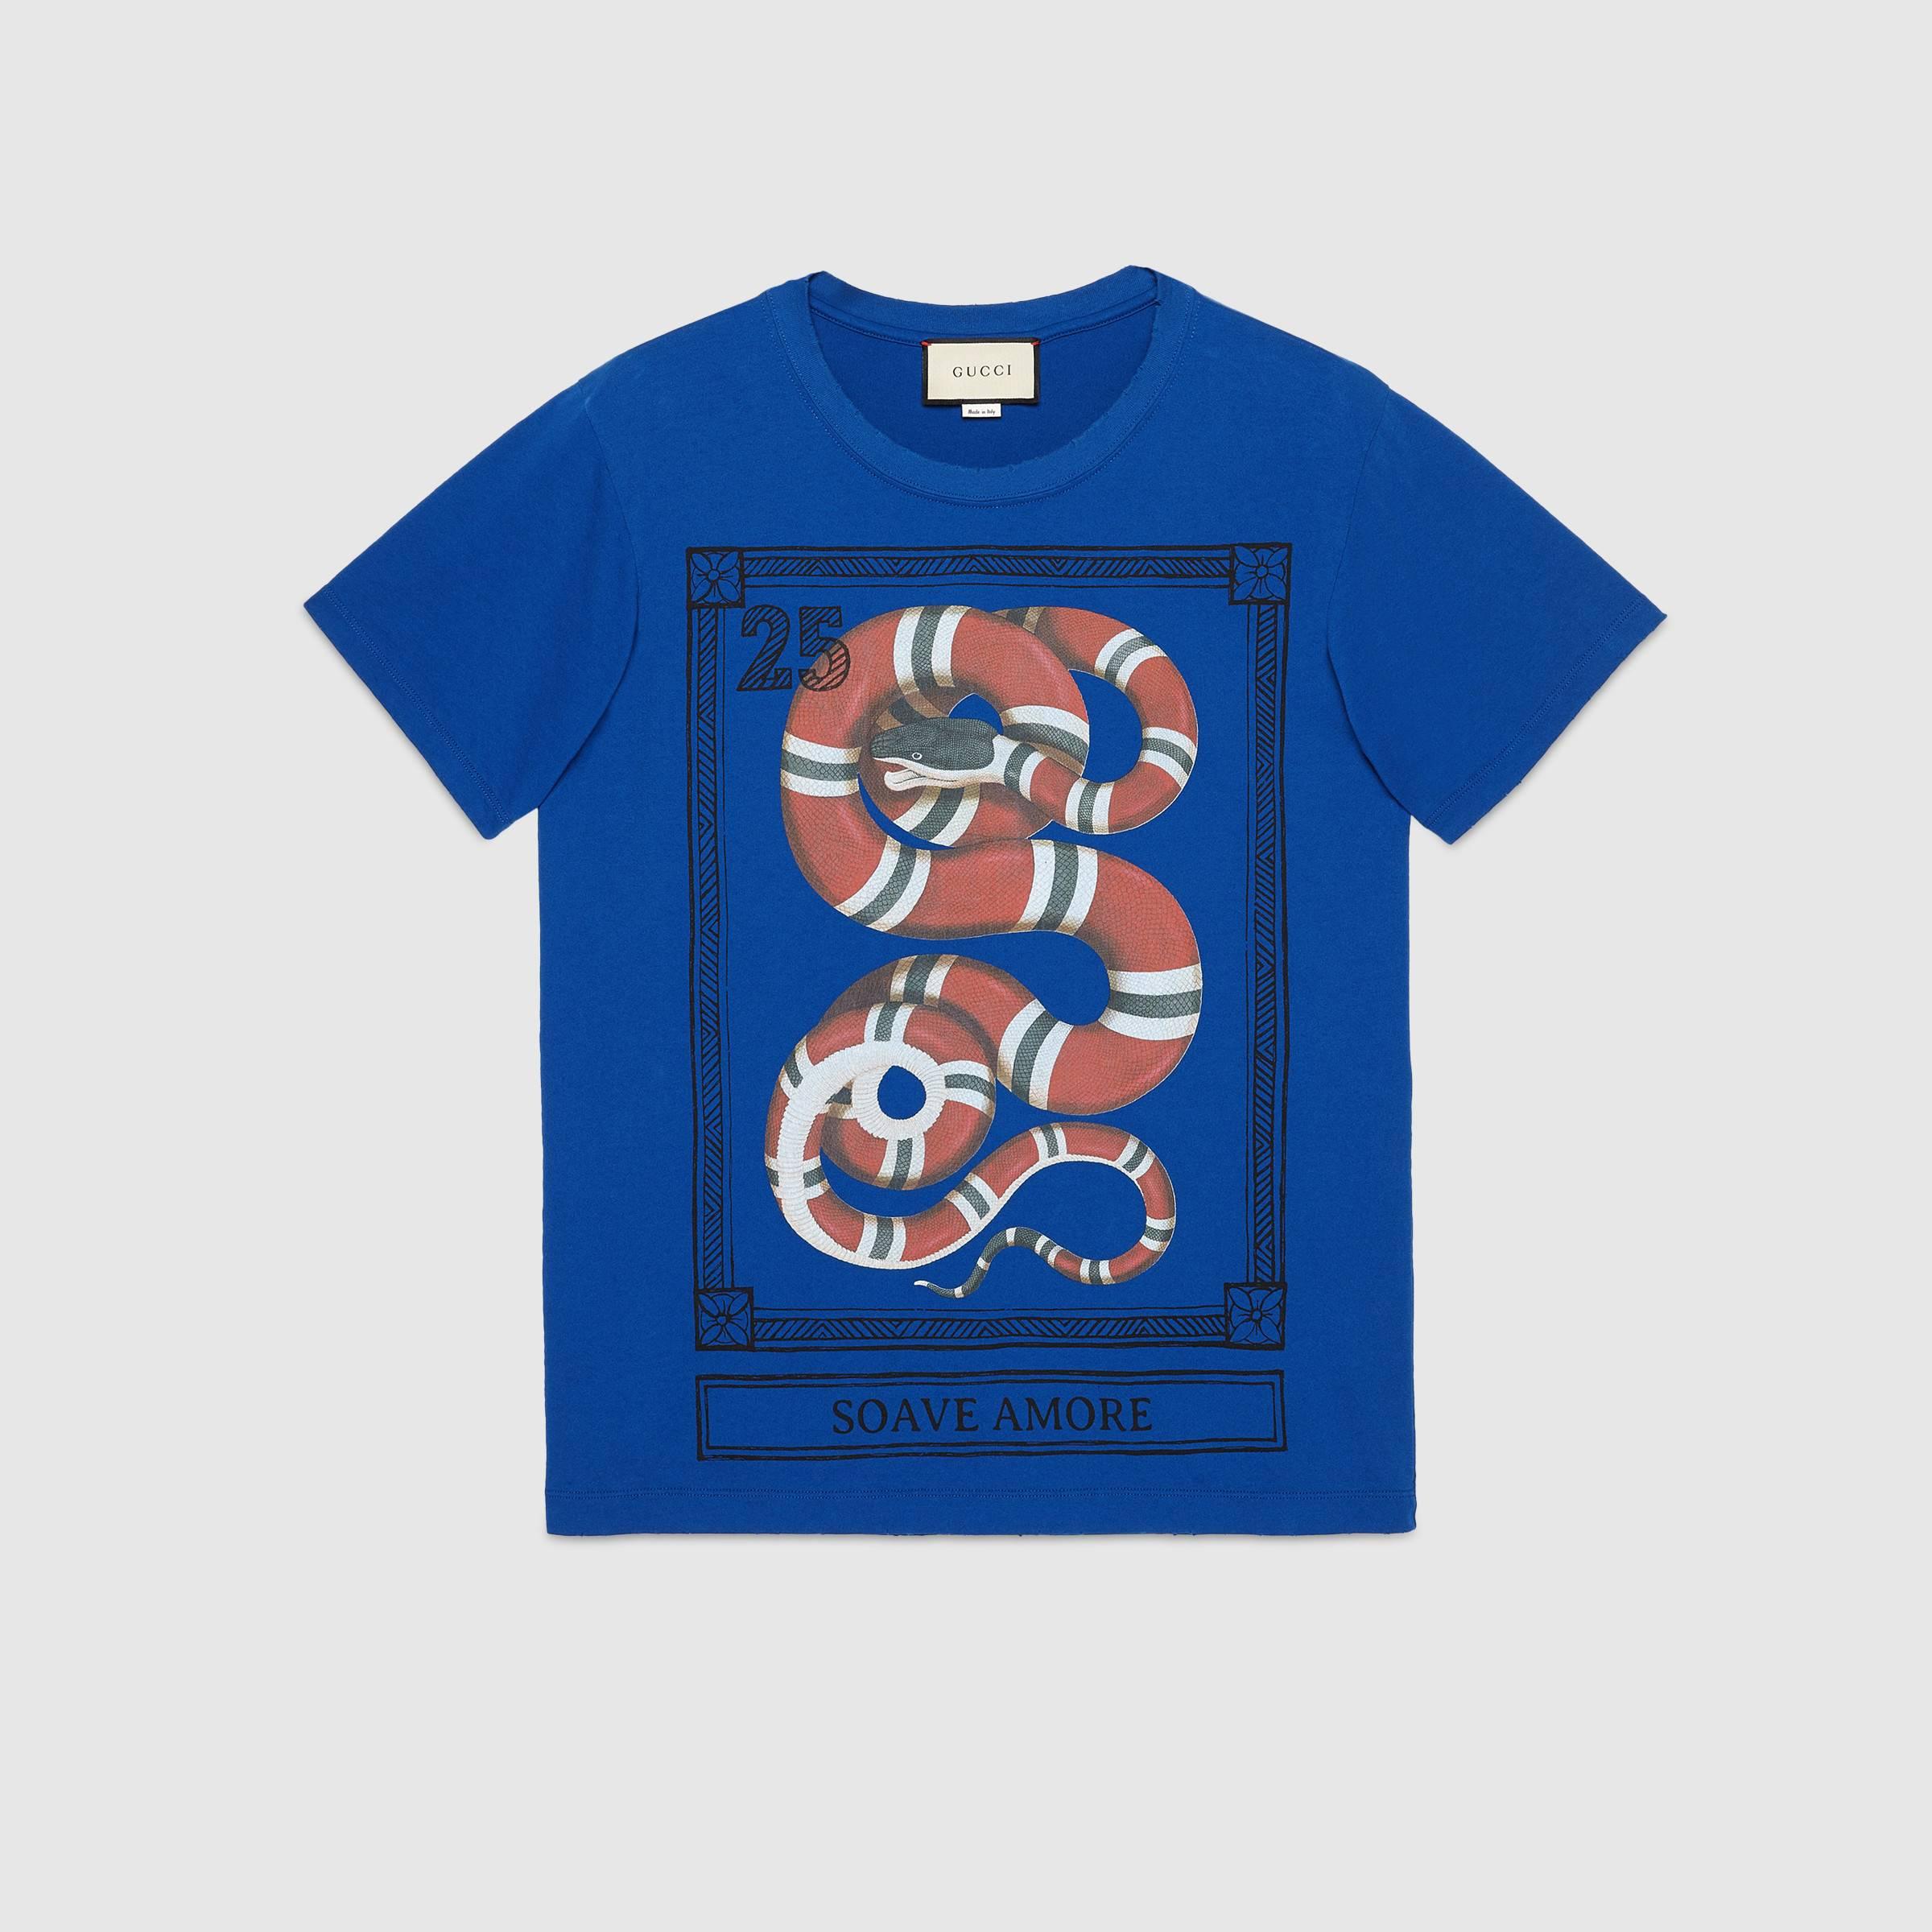 a5b9a434 67981b 493117 x3i30 4736 001 100 0000 light oversize t shirt with kingsnake  print